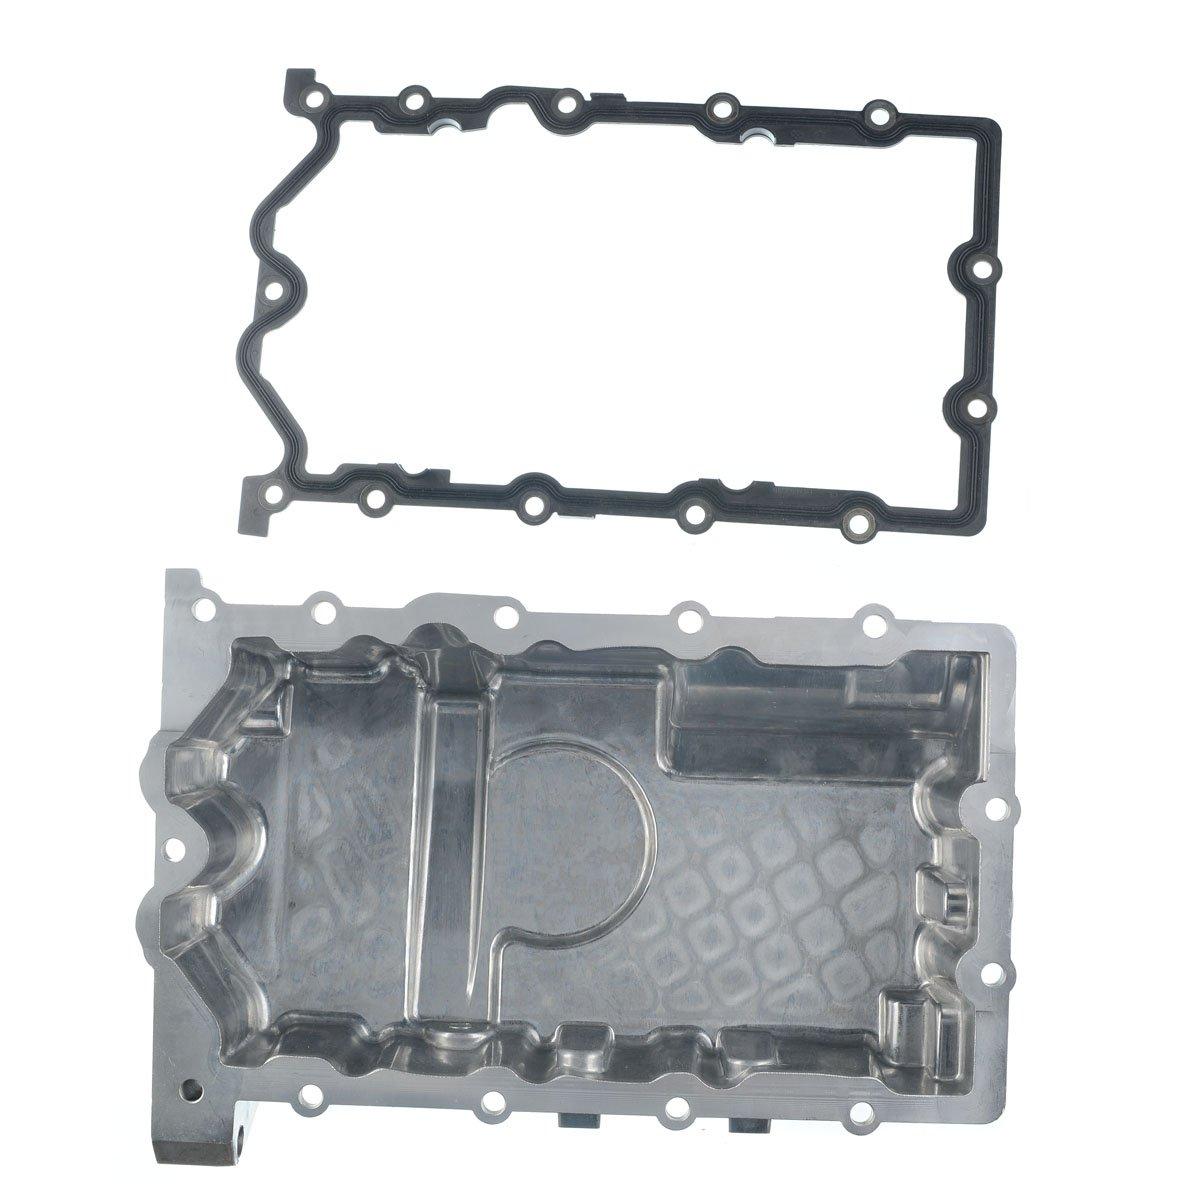 A-Premium Engine Oil pan for Mini Cooper 2002-2008 1.6L 11137513061